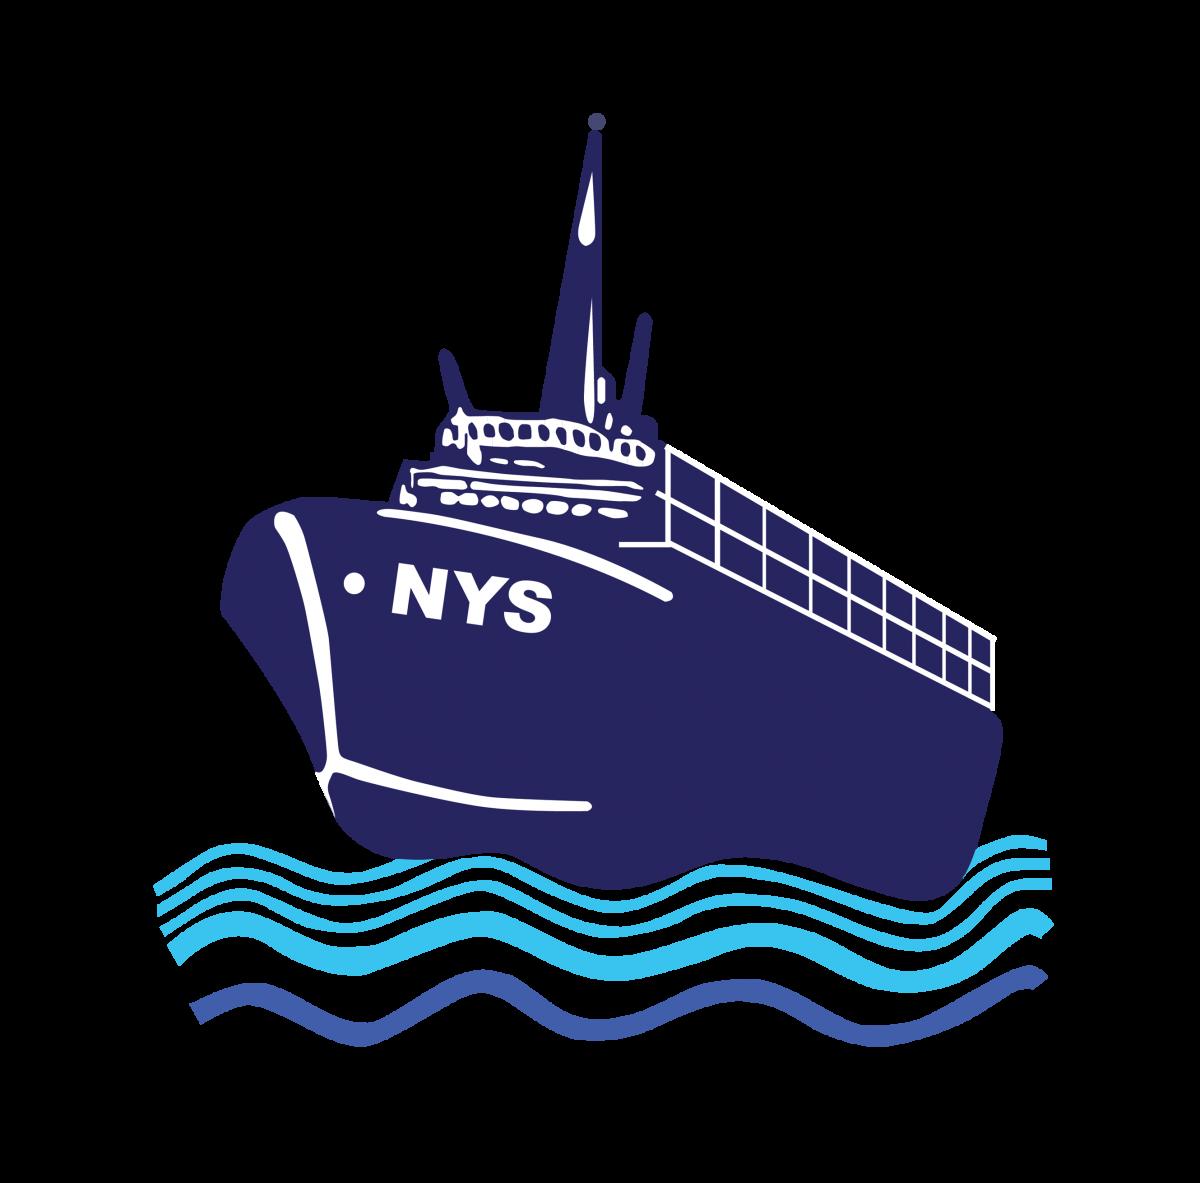 logo_NYY_original-1-1200x1183.png